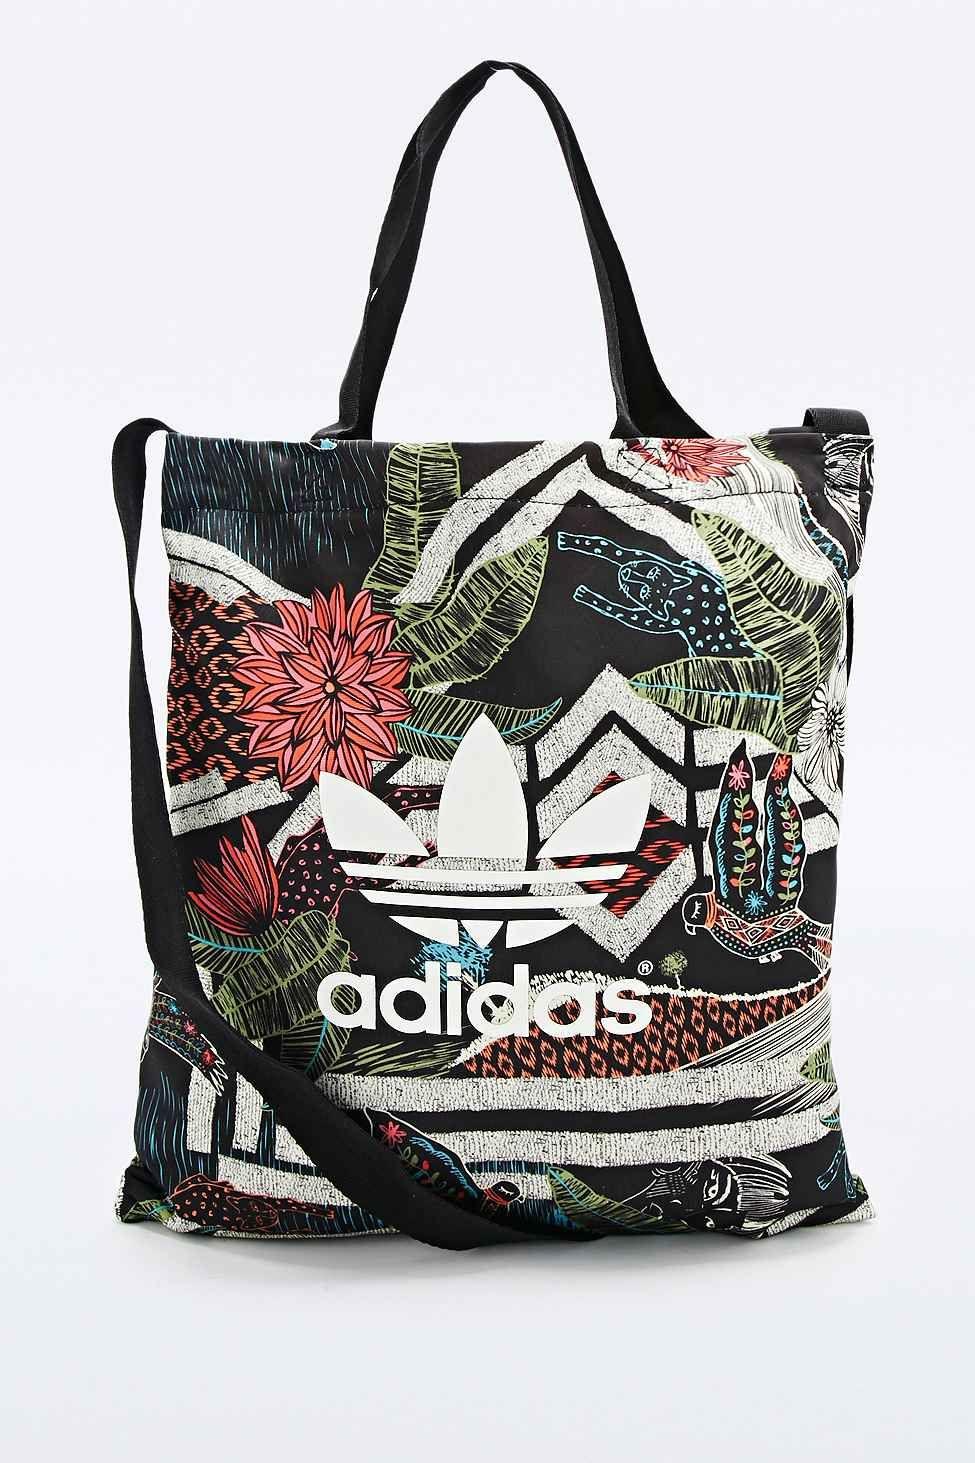 11d2446f02d *URBAN OUTFITTERS - ADIDAS XFL || Printed shopper bag | Bolsa shopper  estampada